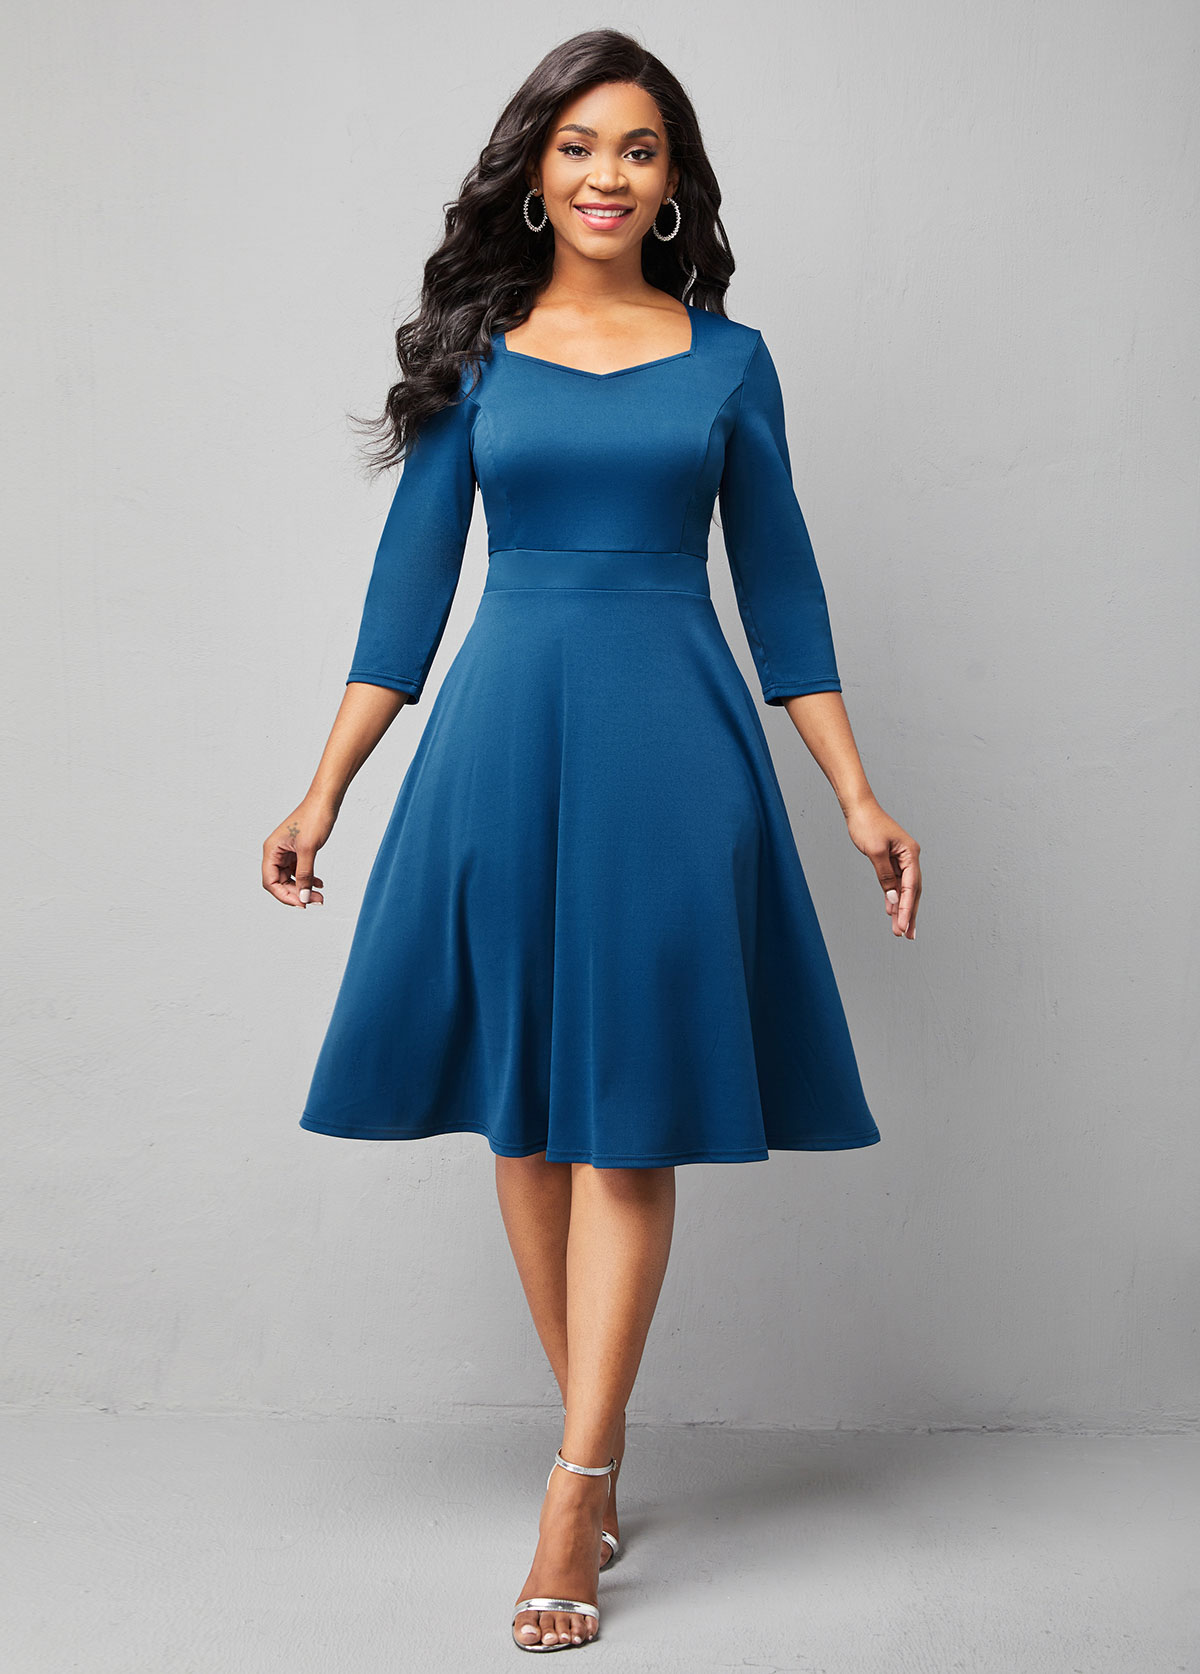 ROTITA 3/4 Sleeve Solid Sweetheart Neckline Dress